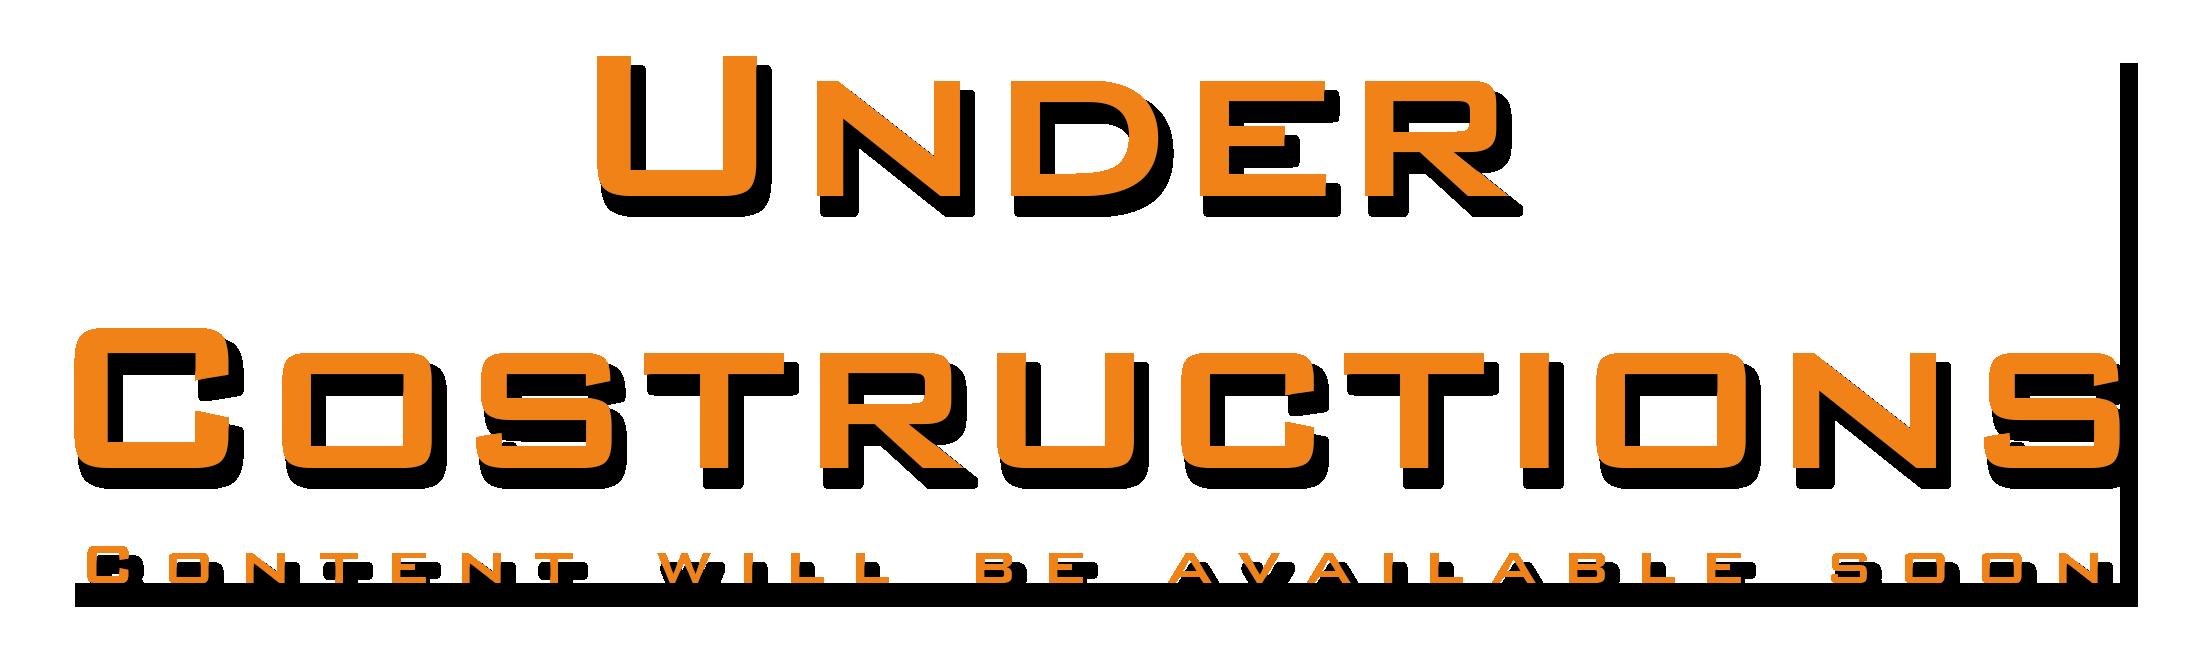 under-costruction